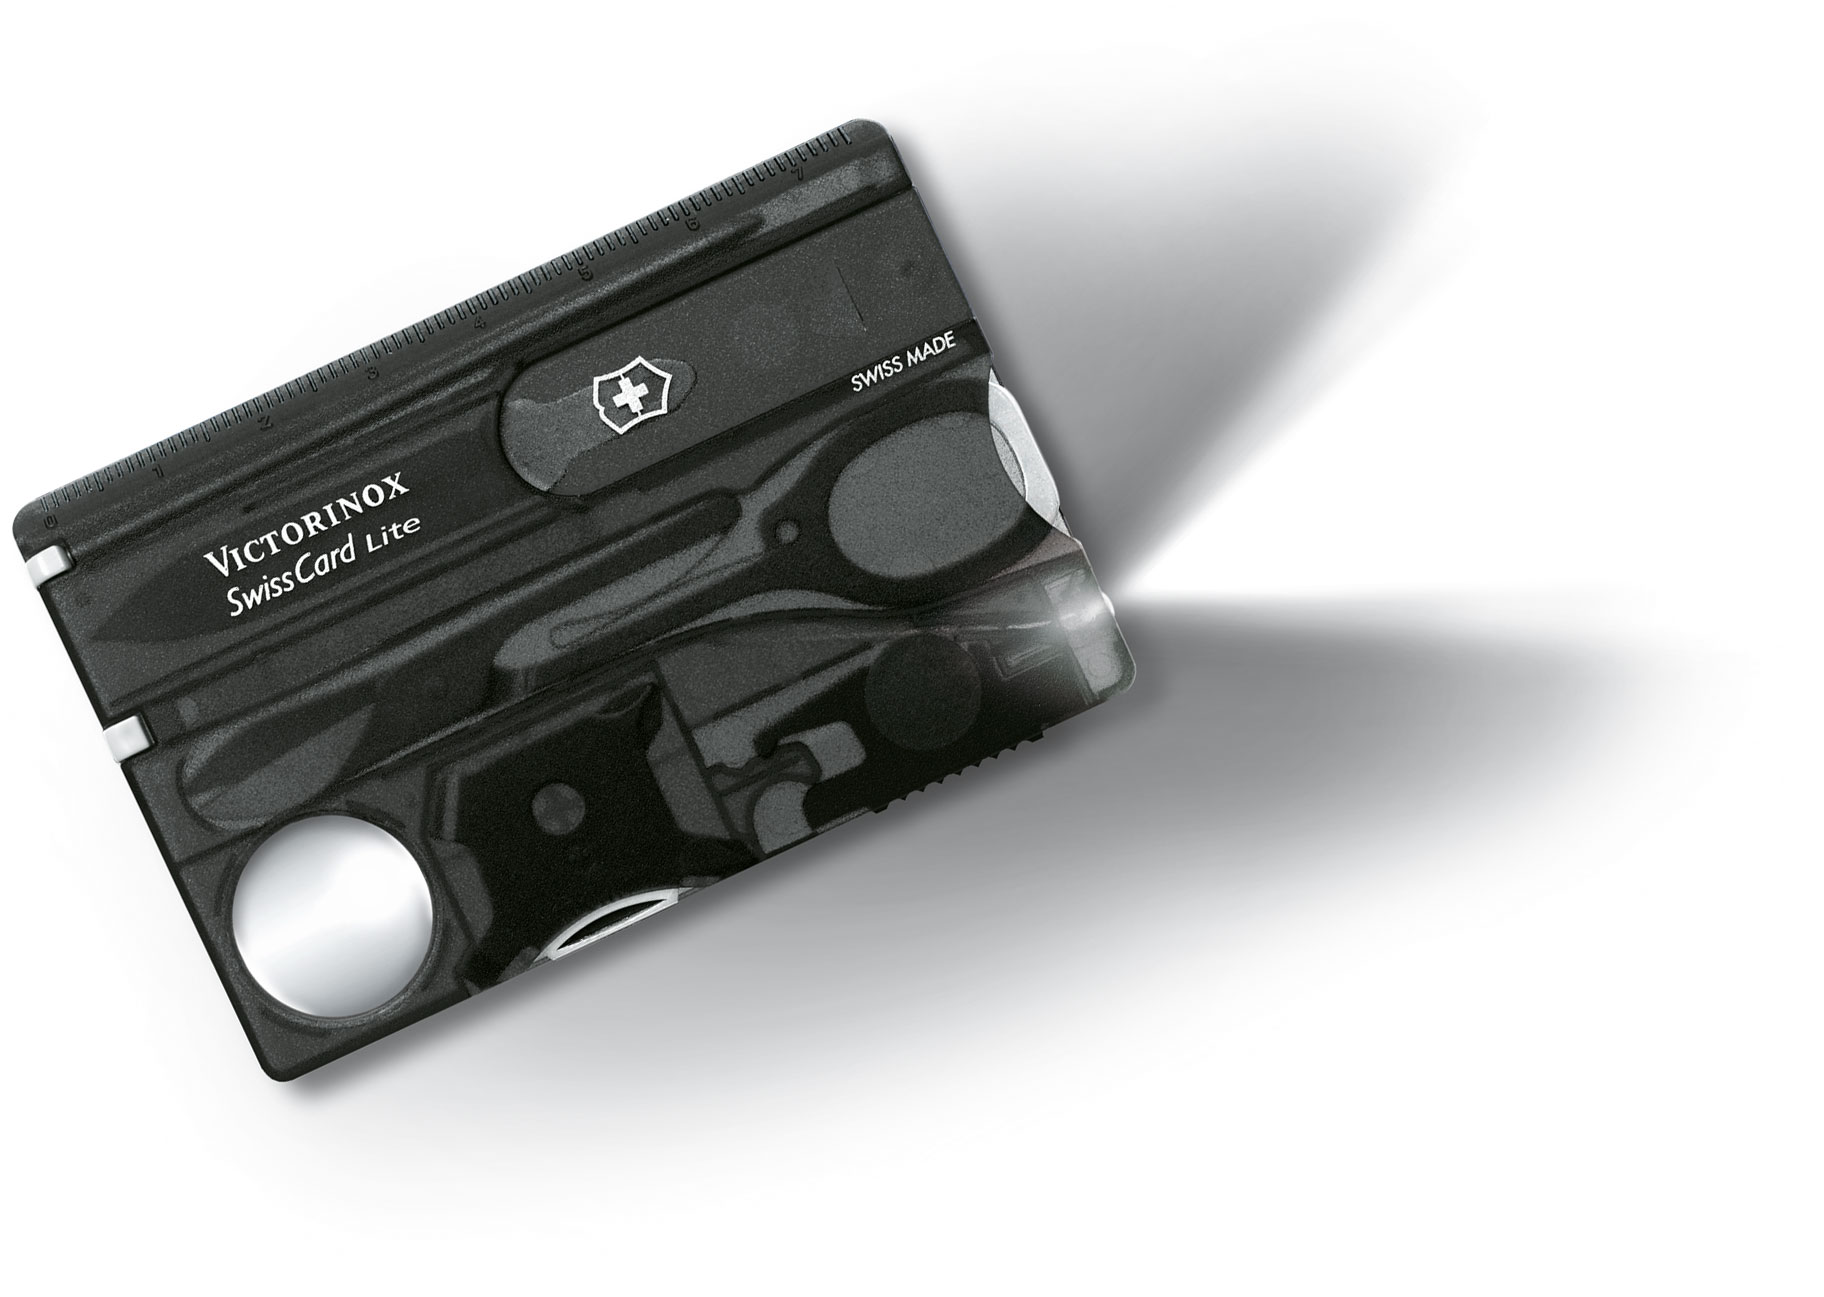 Victorinox Swiss Army SwissCard Lite Multi-Tool with White LED Light, Translucent Onyx